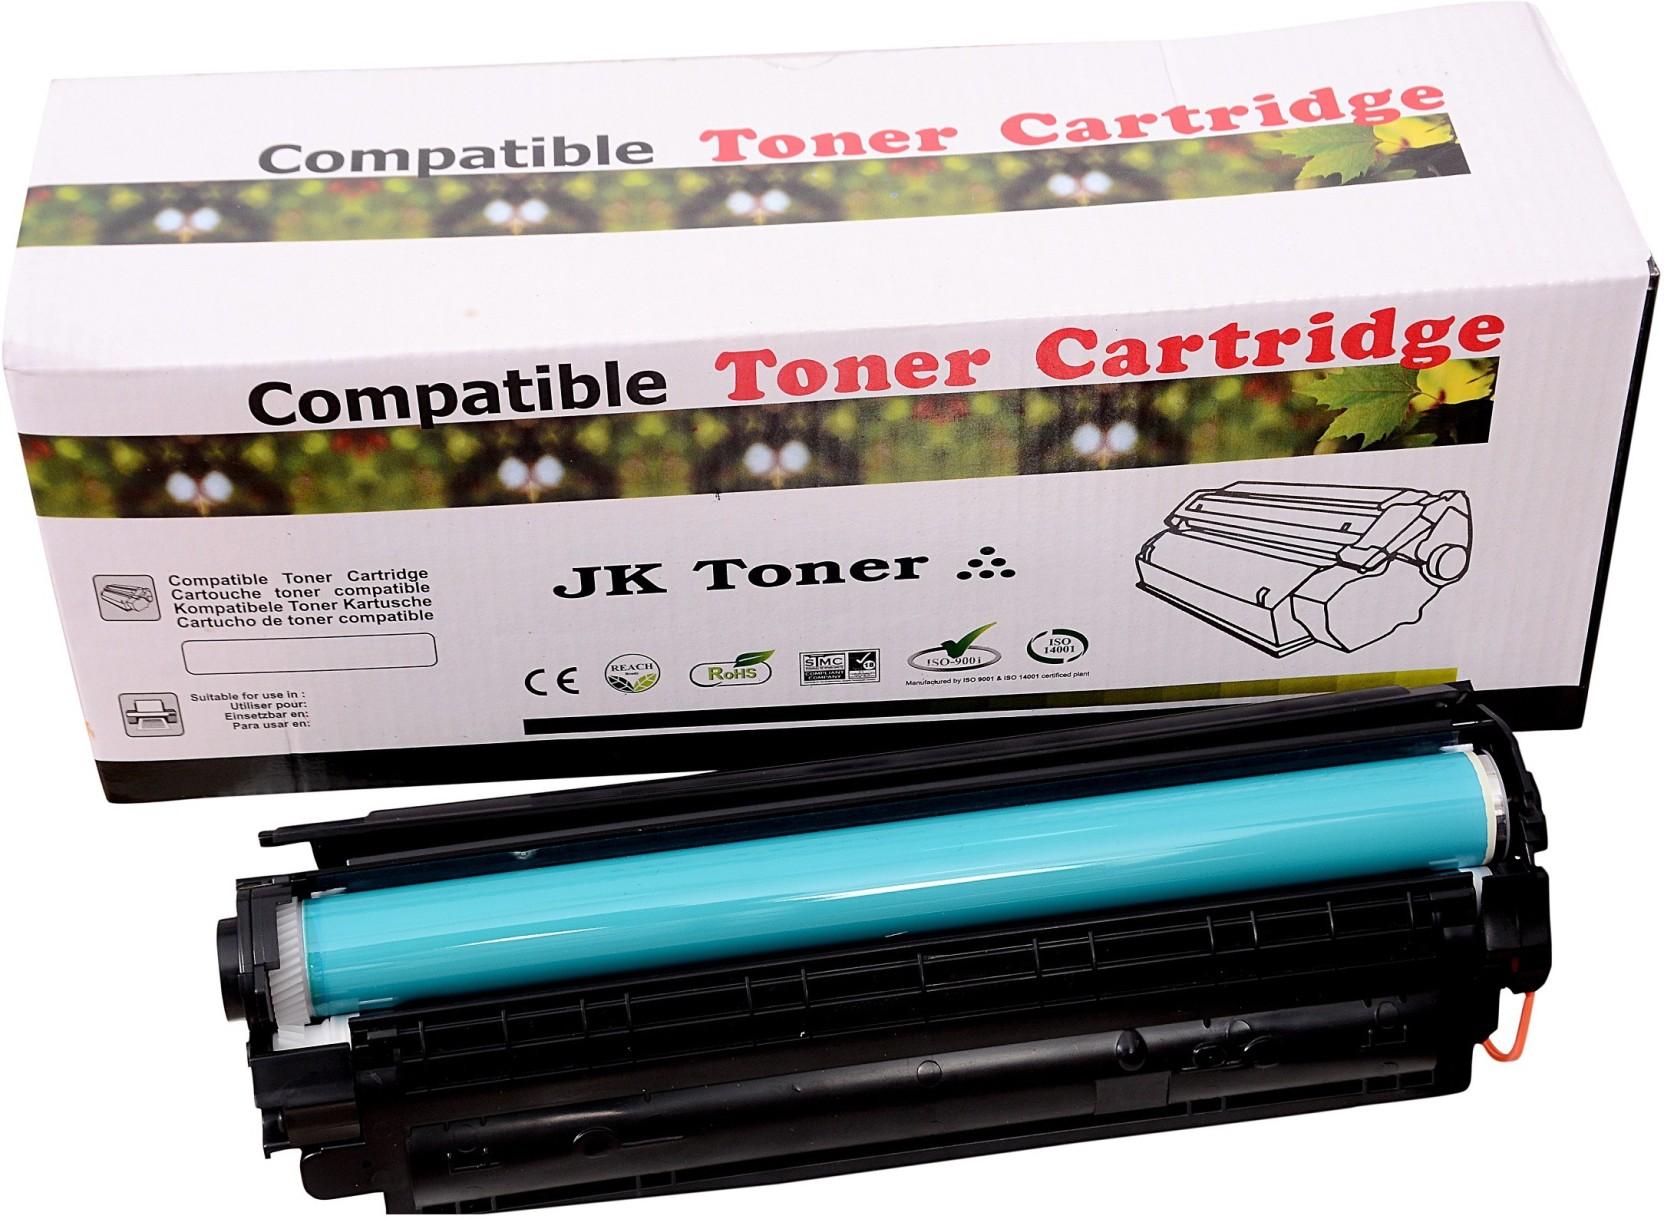 Jk Toners 12a Black Toner Cartridge Compatible For Hp Laserjet 1020 Add To Cart